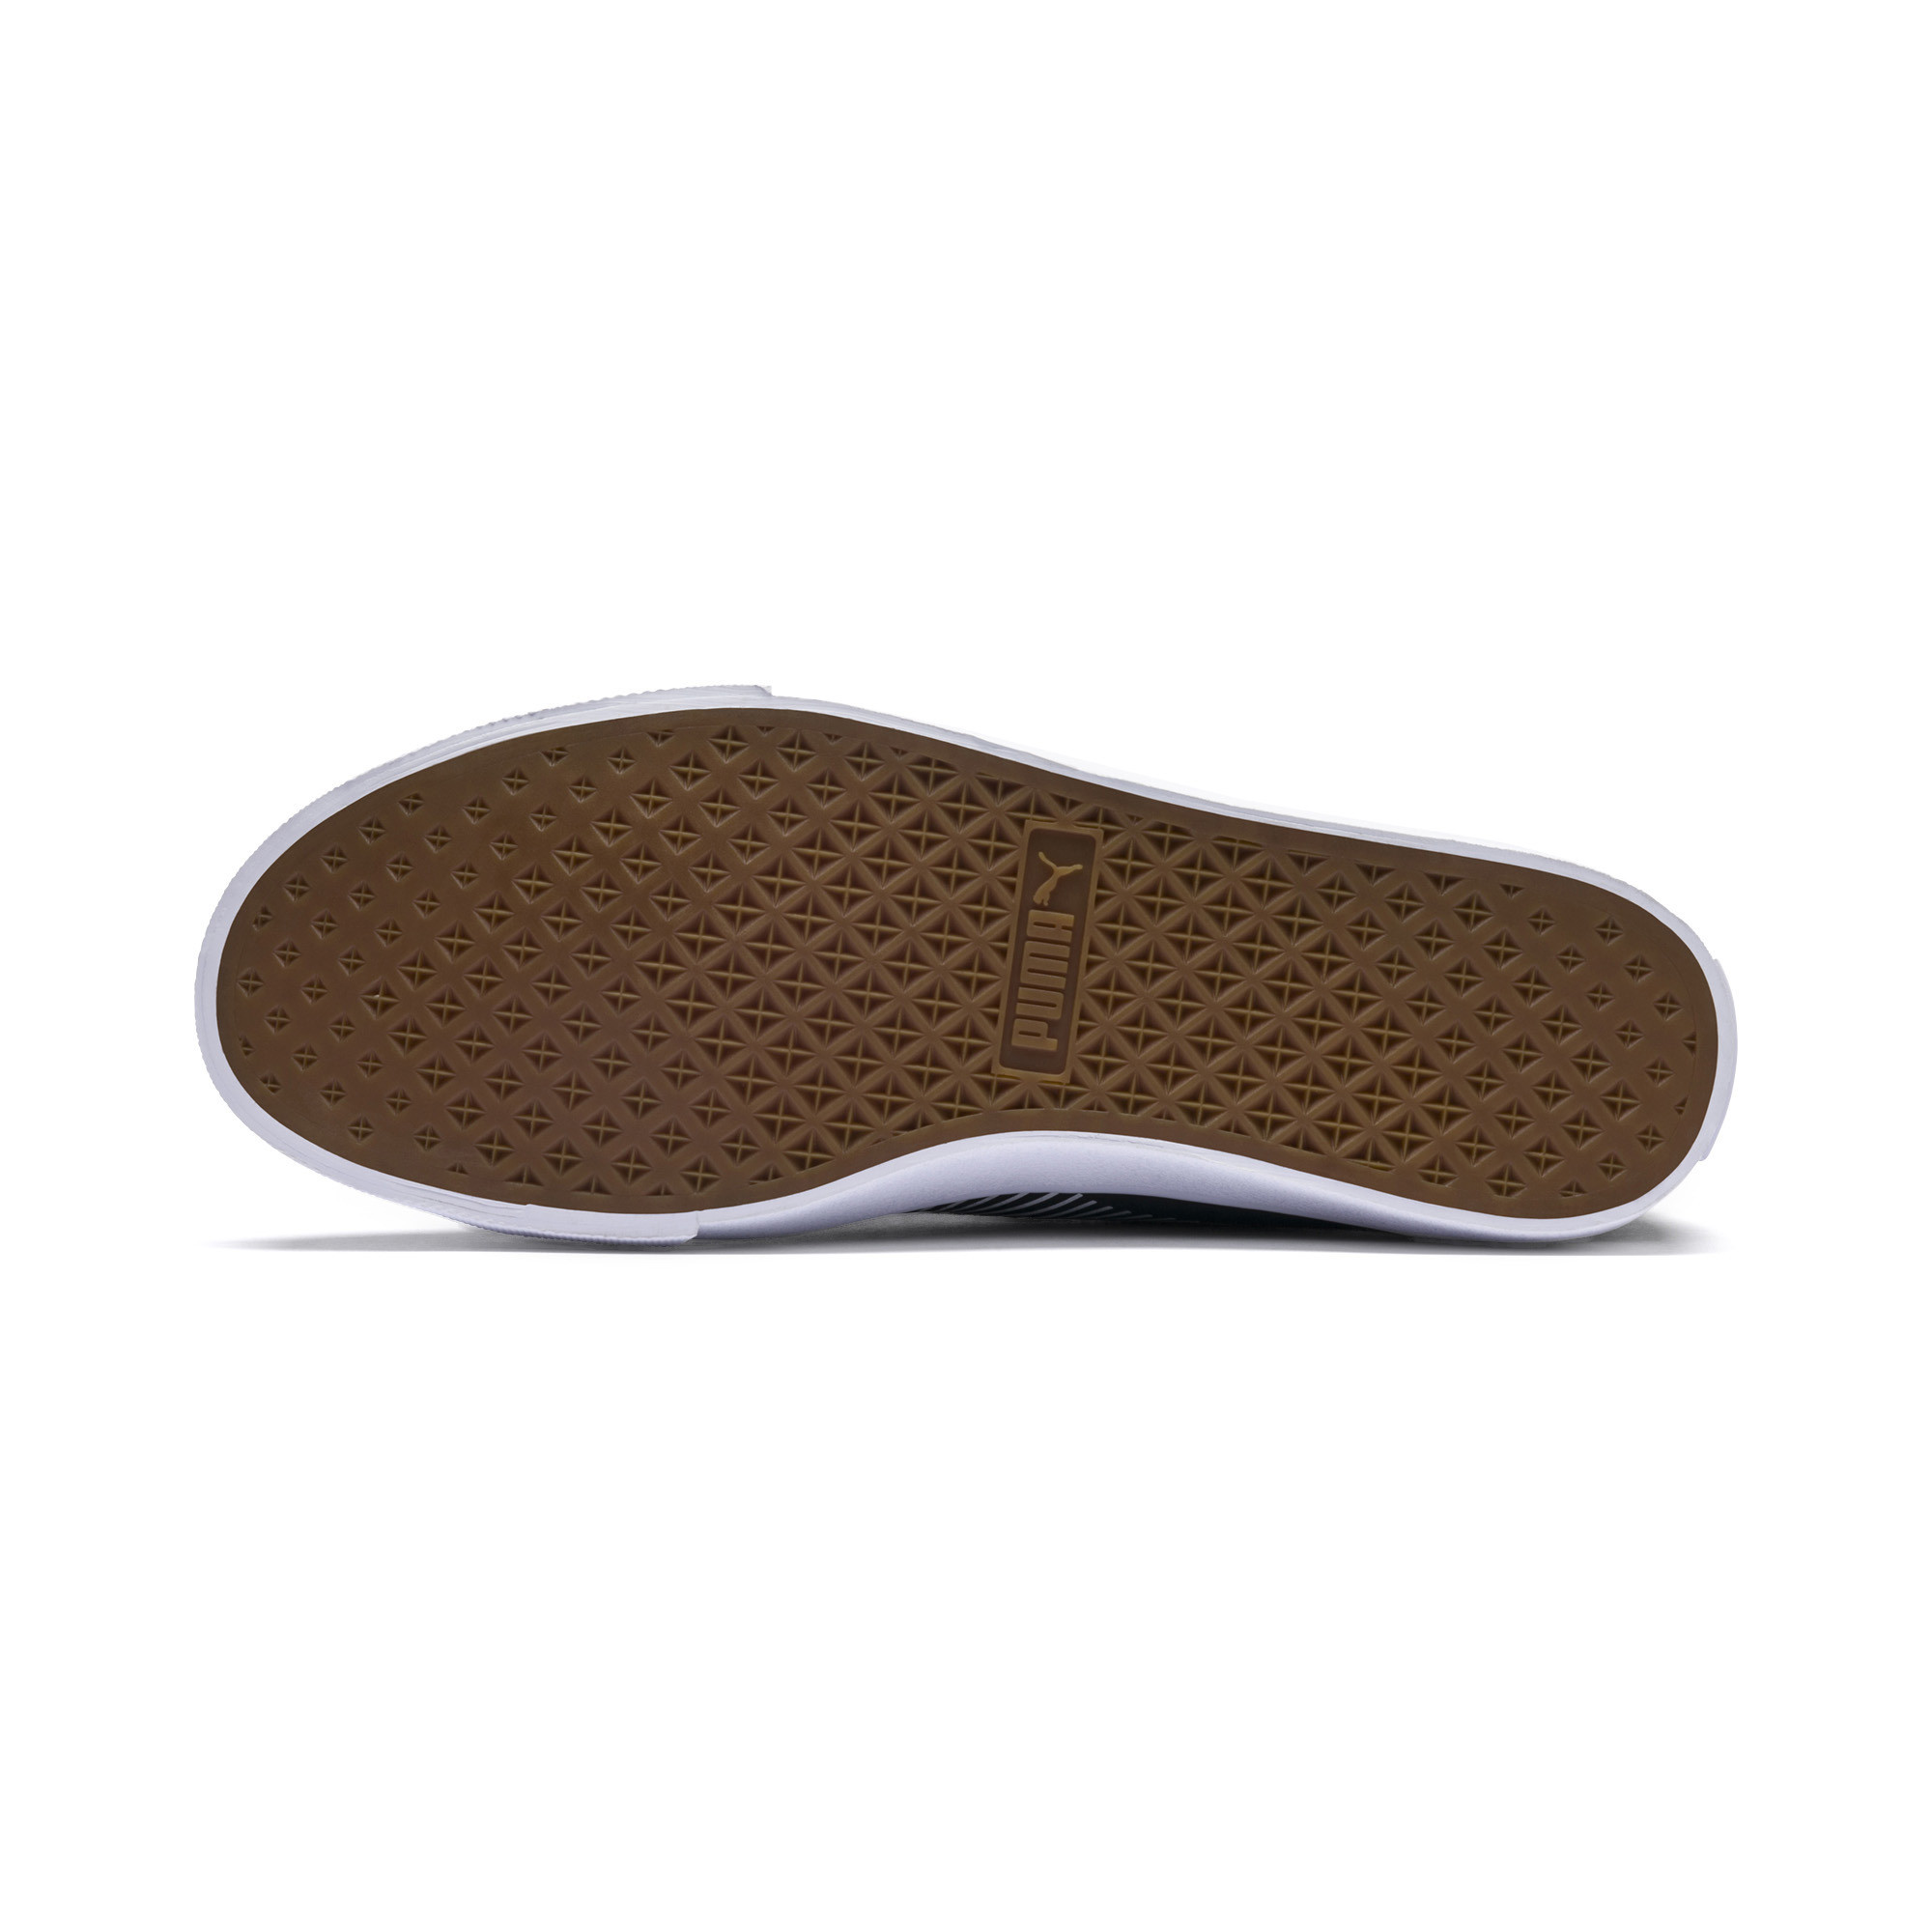 PUMA-Bari-Sneakers-Men-Shoe-Basics thumbnail 5